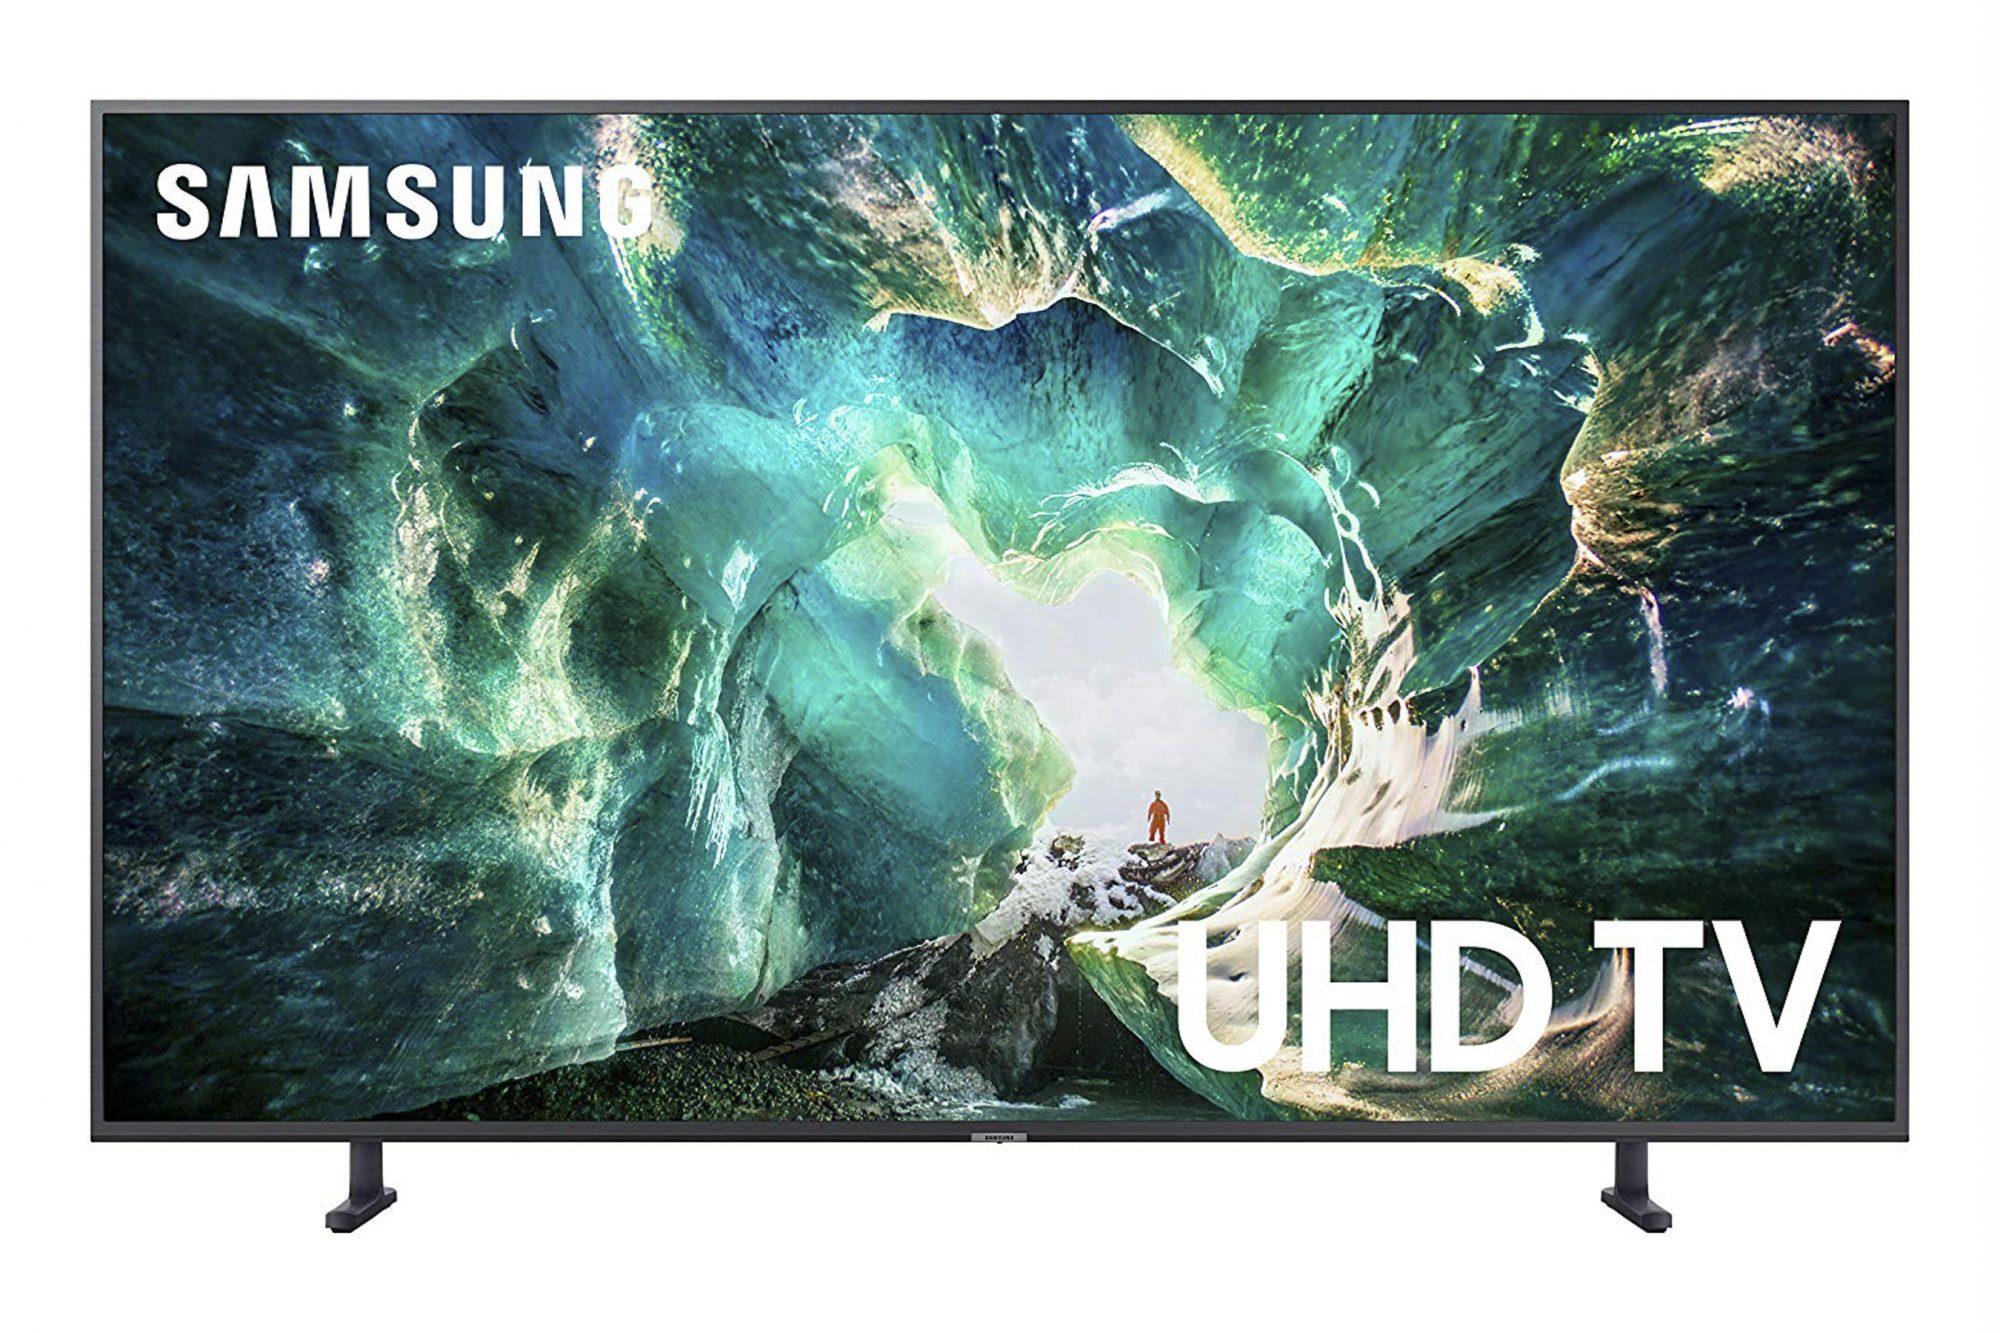 Samsung TV CR: Samsung